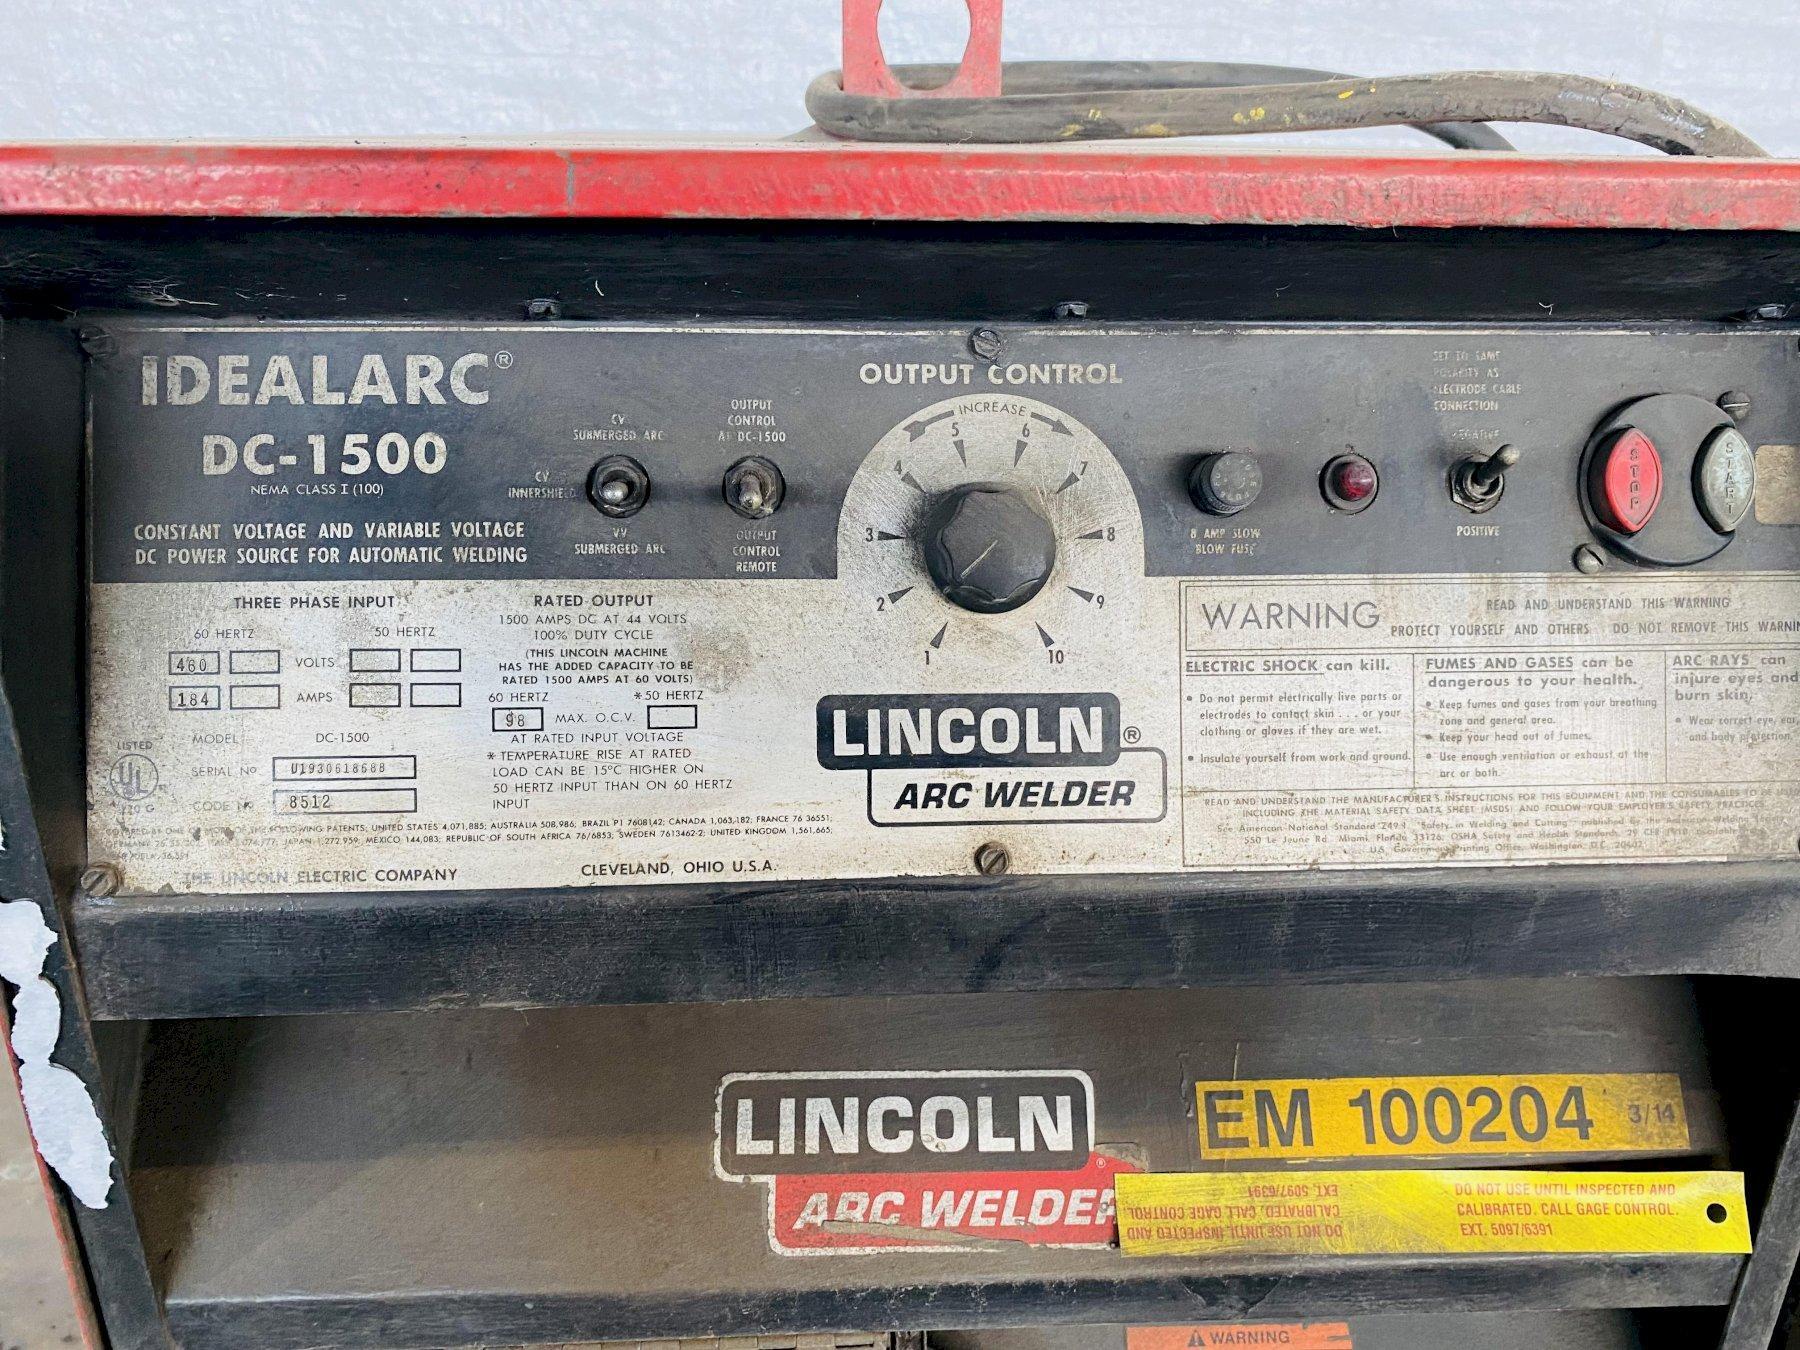 1500 AMP LINCOLN IDEALARC DC-1500 WELDER. STOCK # 0631021